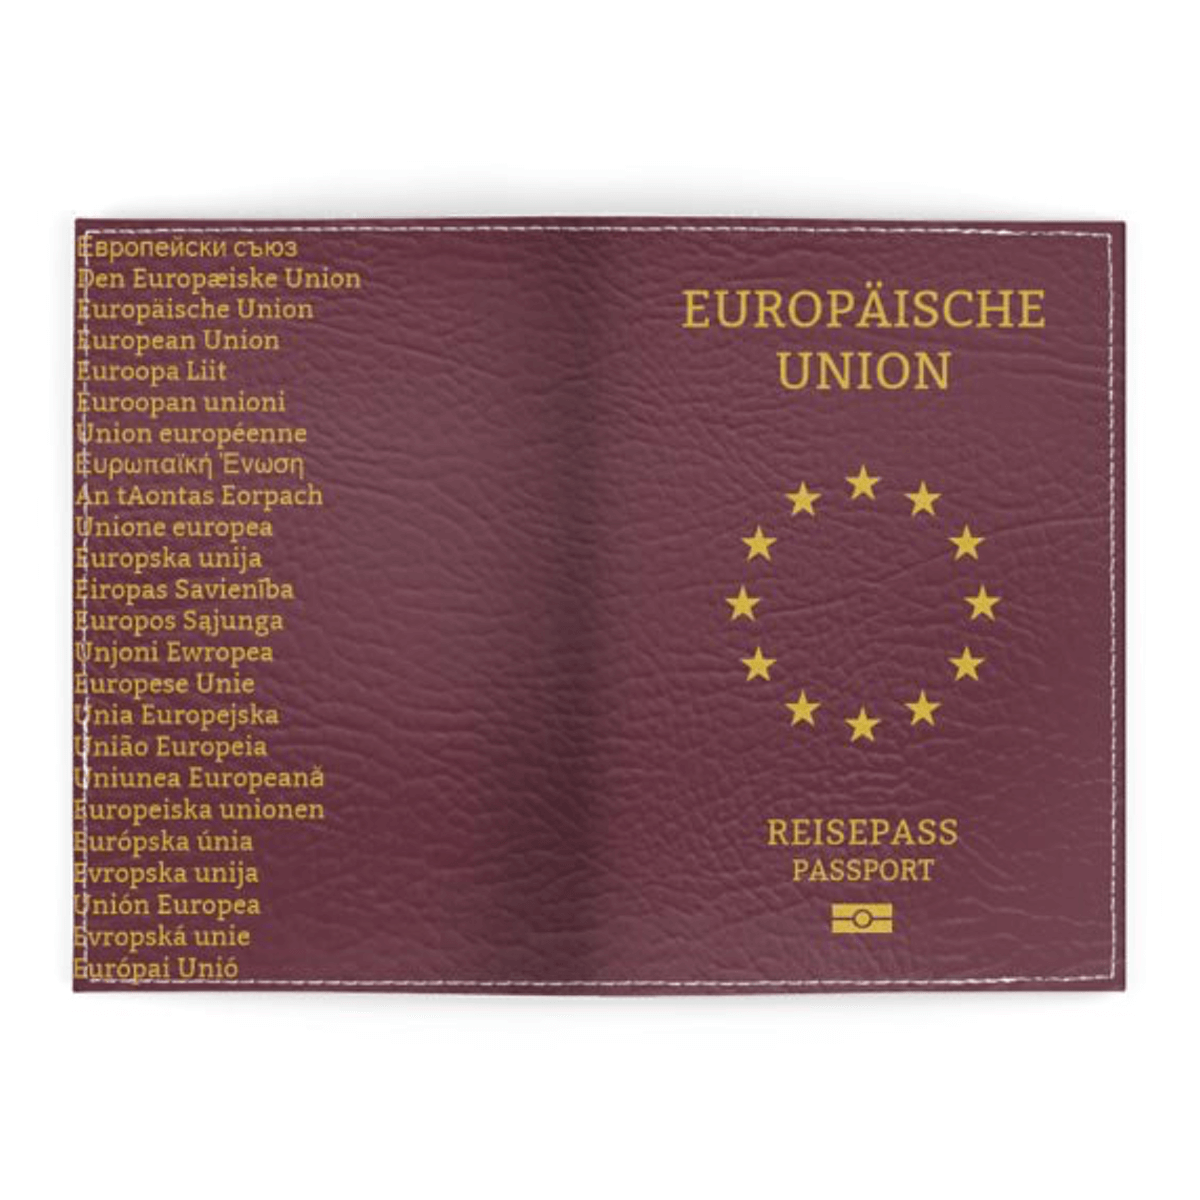 Europaische Union Passport Cover